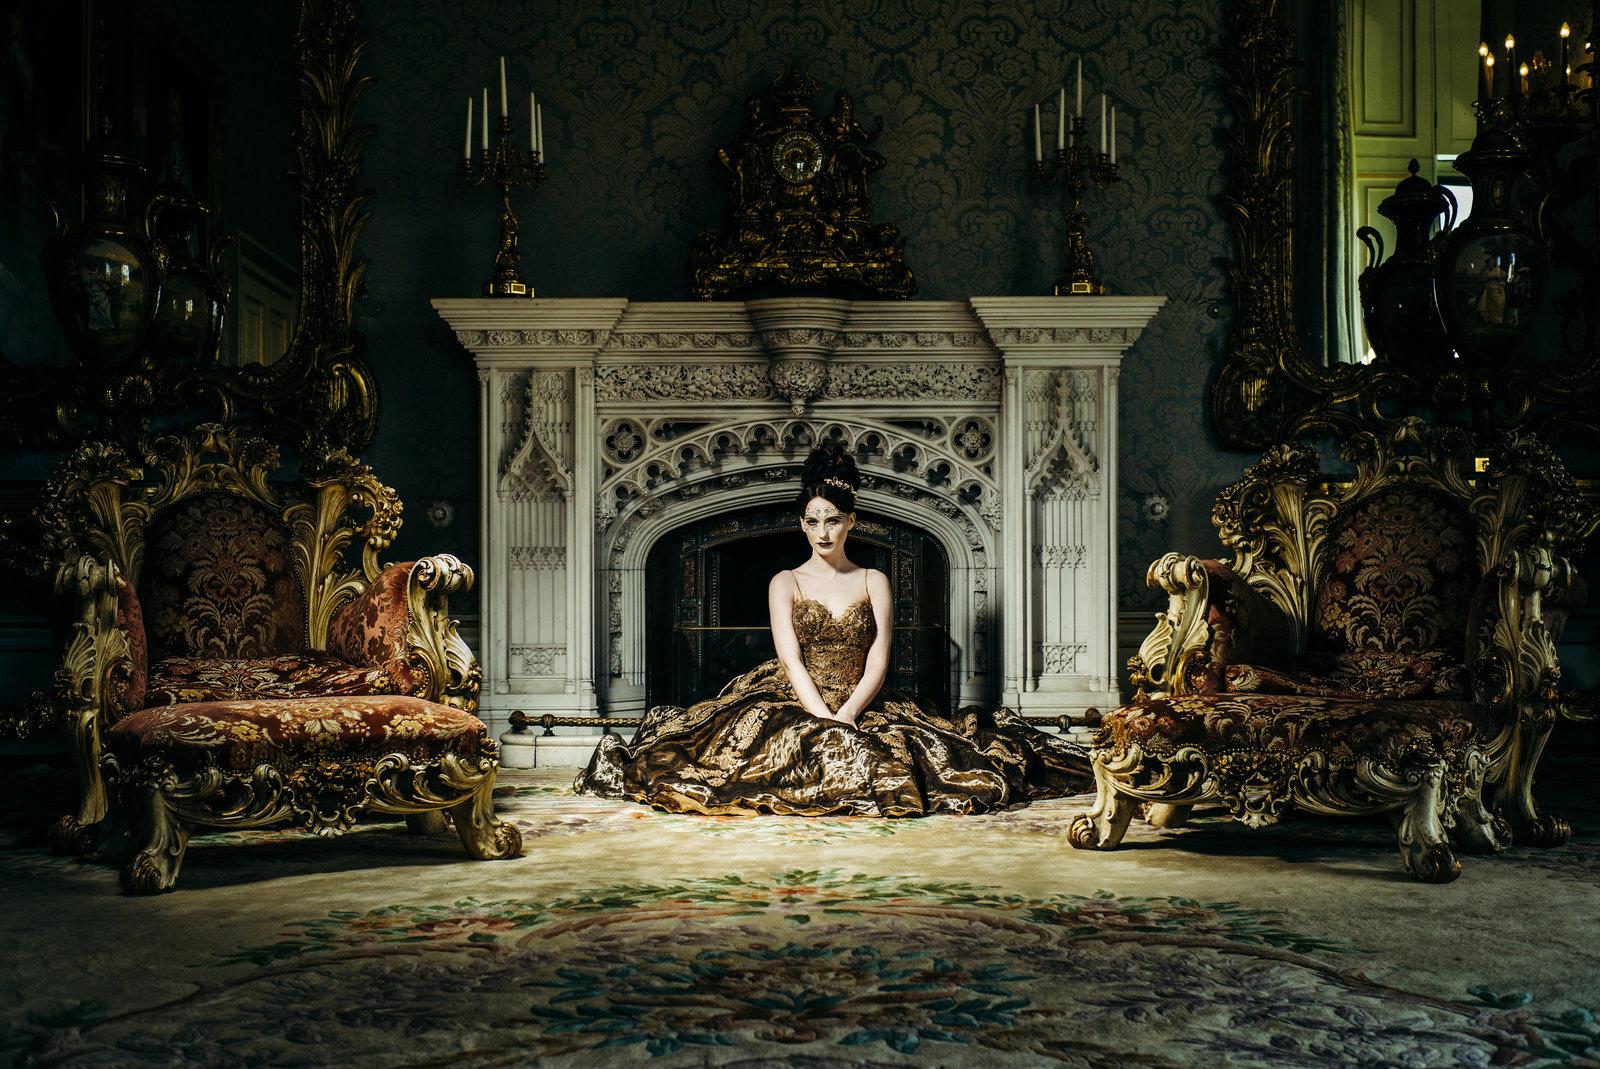 Krysanthe_gold_silk_lace_ballgown_JoanneFlemingDesign_MartinFryattPhoto_web1